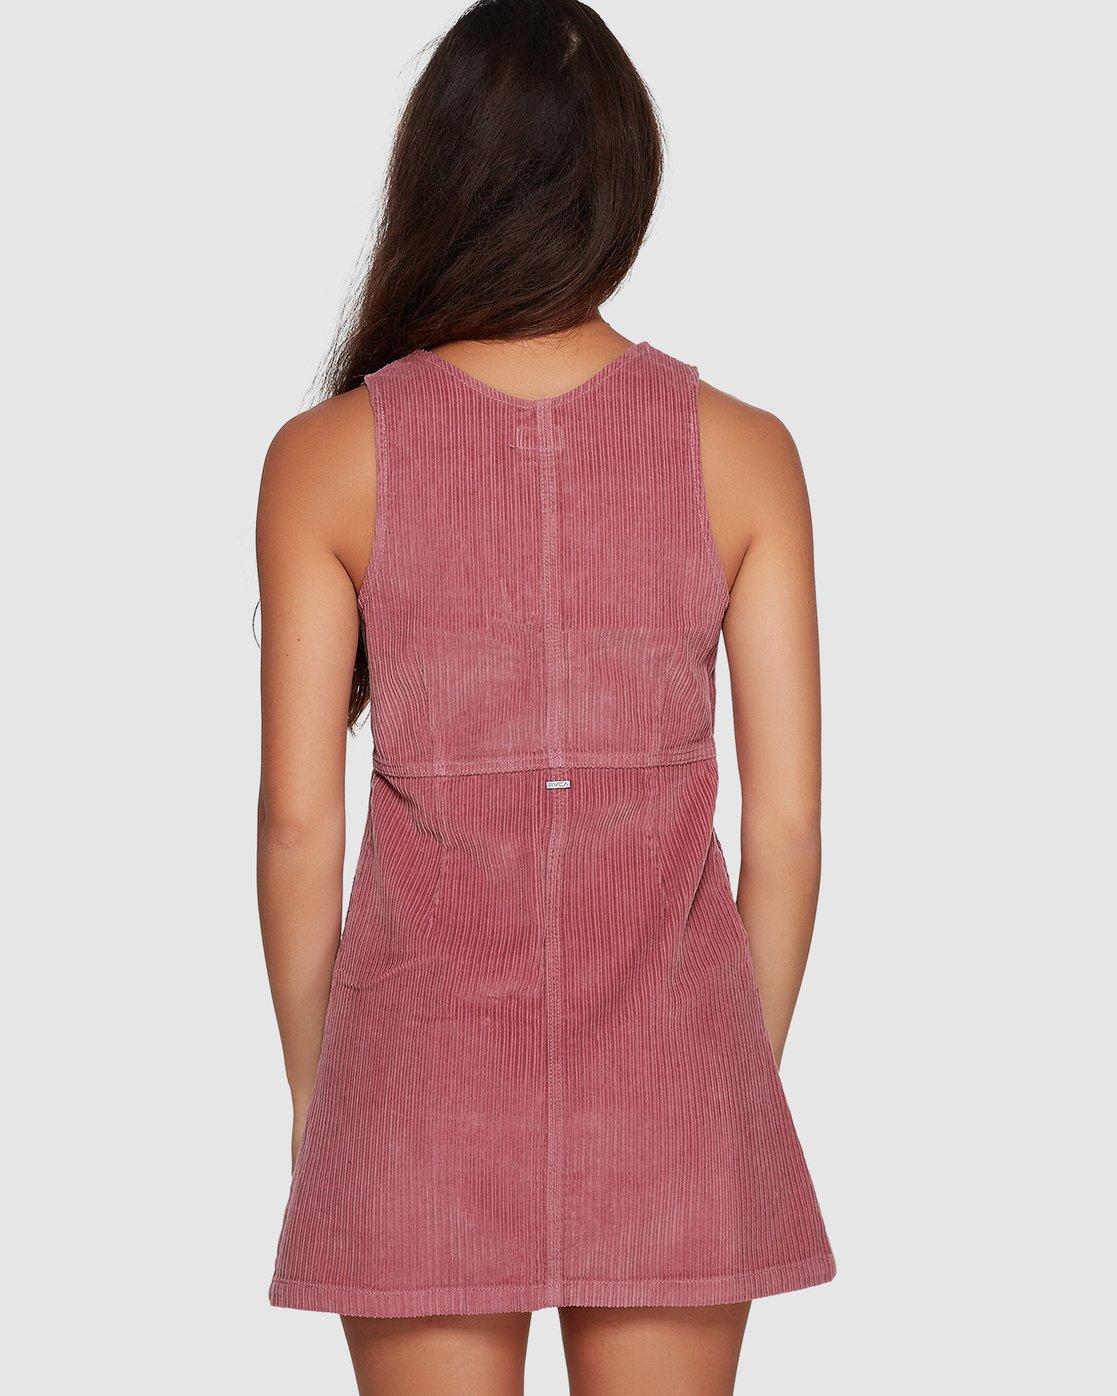 2 Plush Faithless Dress Purple R207760 RVCA